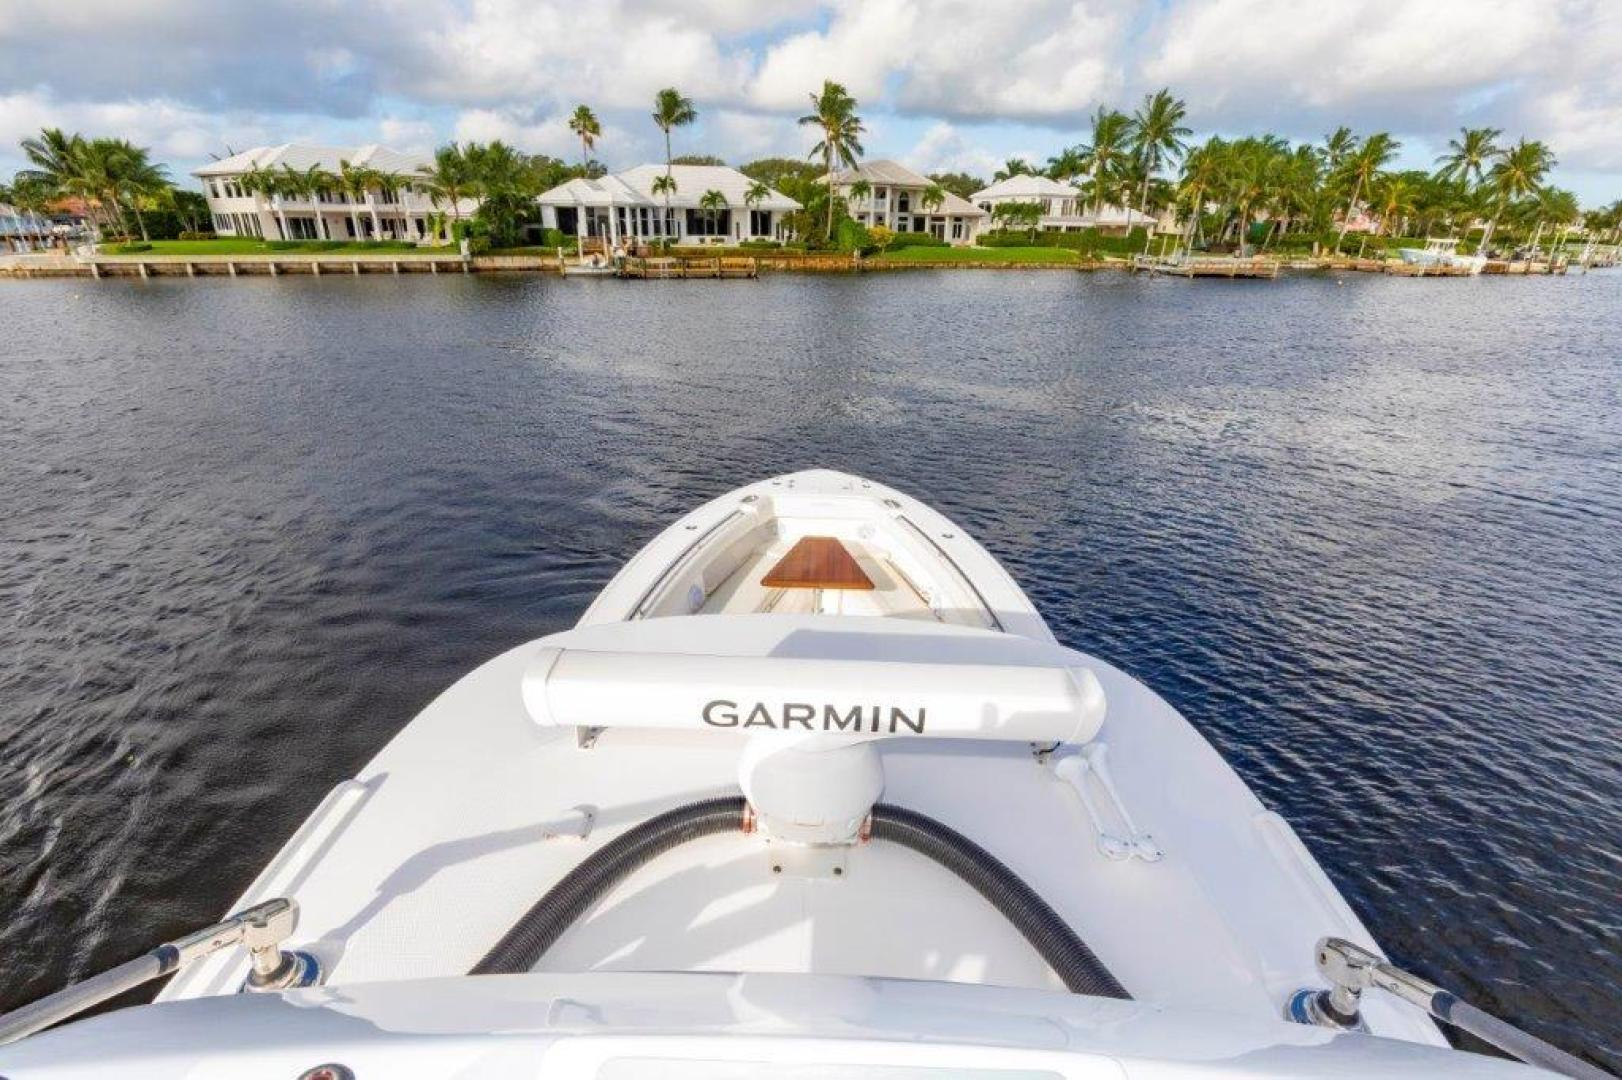 Everglades-435 Center Console 2019-Bahama Papa Palm Beach Gardens-Florida-United States-Radar-1570519 | Thumbnail